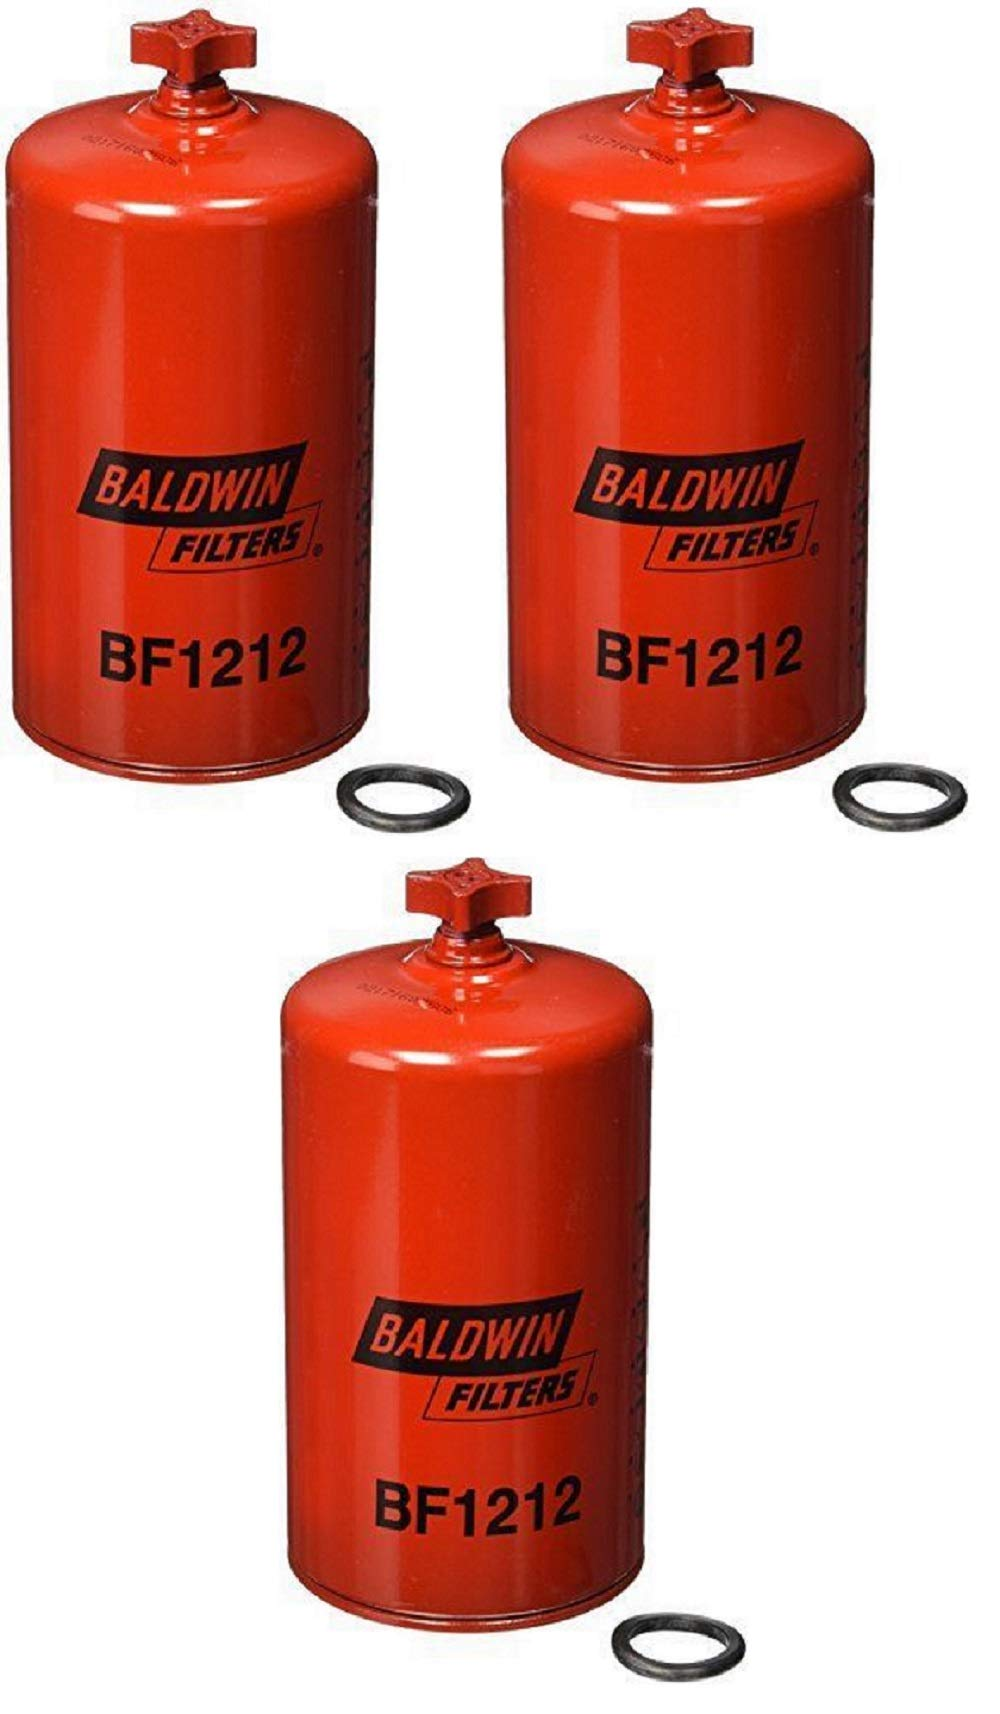 Baldwin BF1212 Heavy Duty Diesel Fuel Spin-On Filter (Pack of 3)